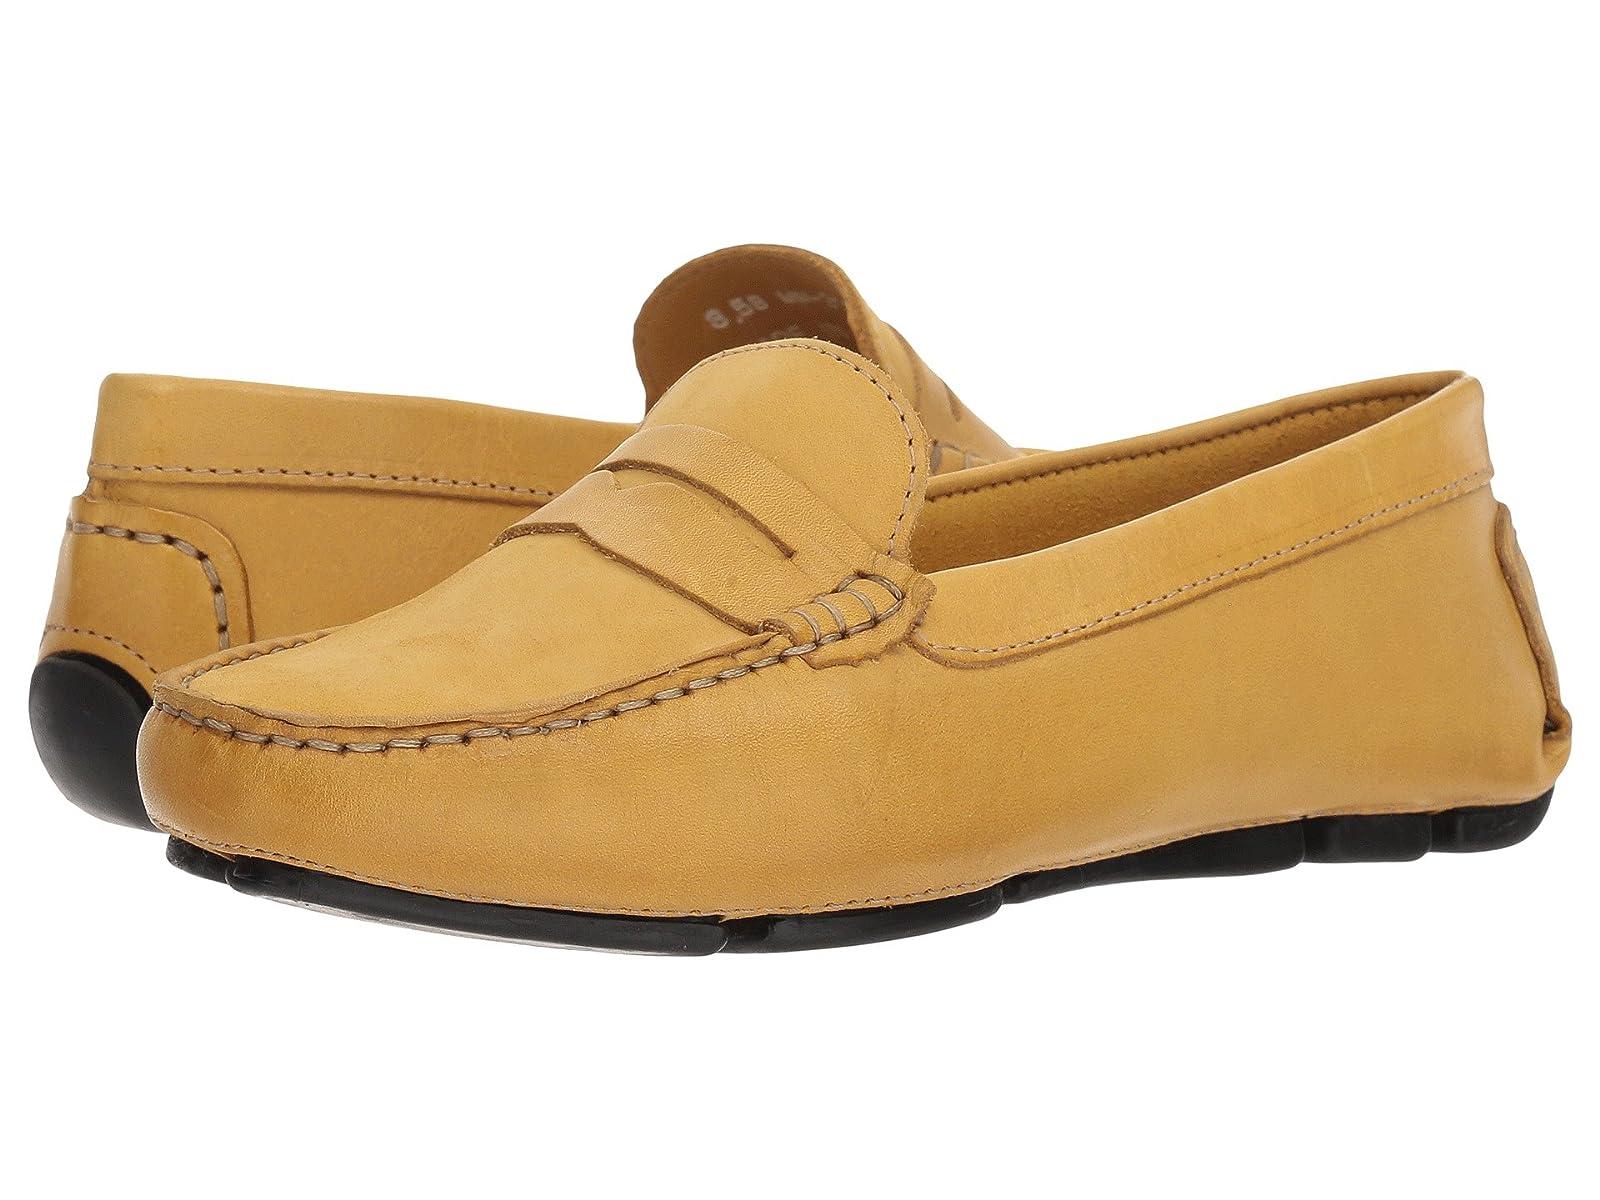 Massimo Matteo Leather Nubuck PennyAtmospheric grades have affordable shoes